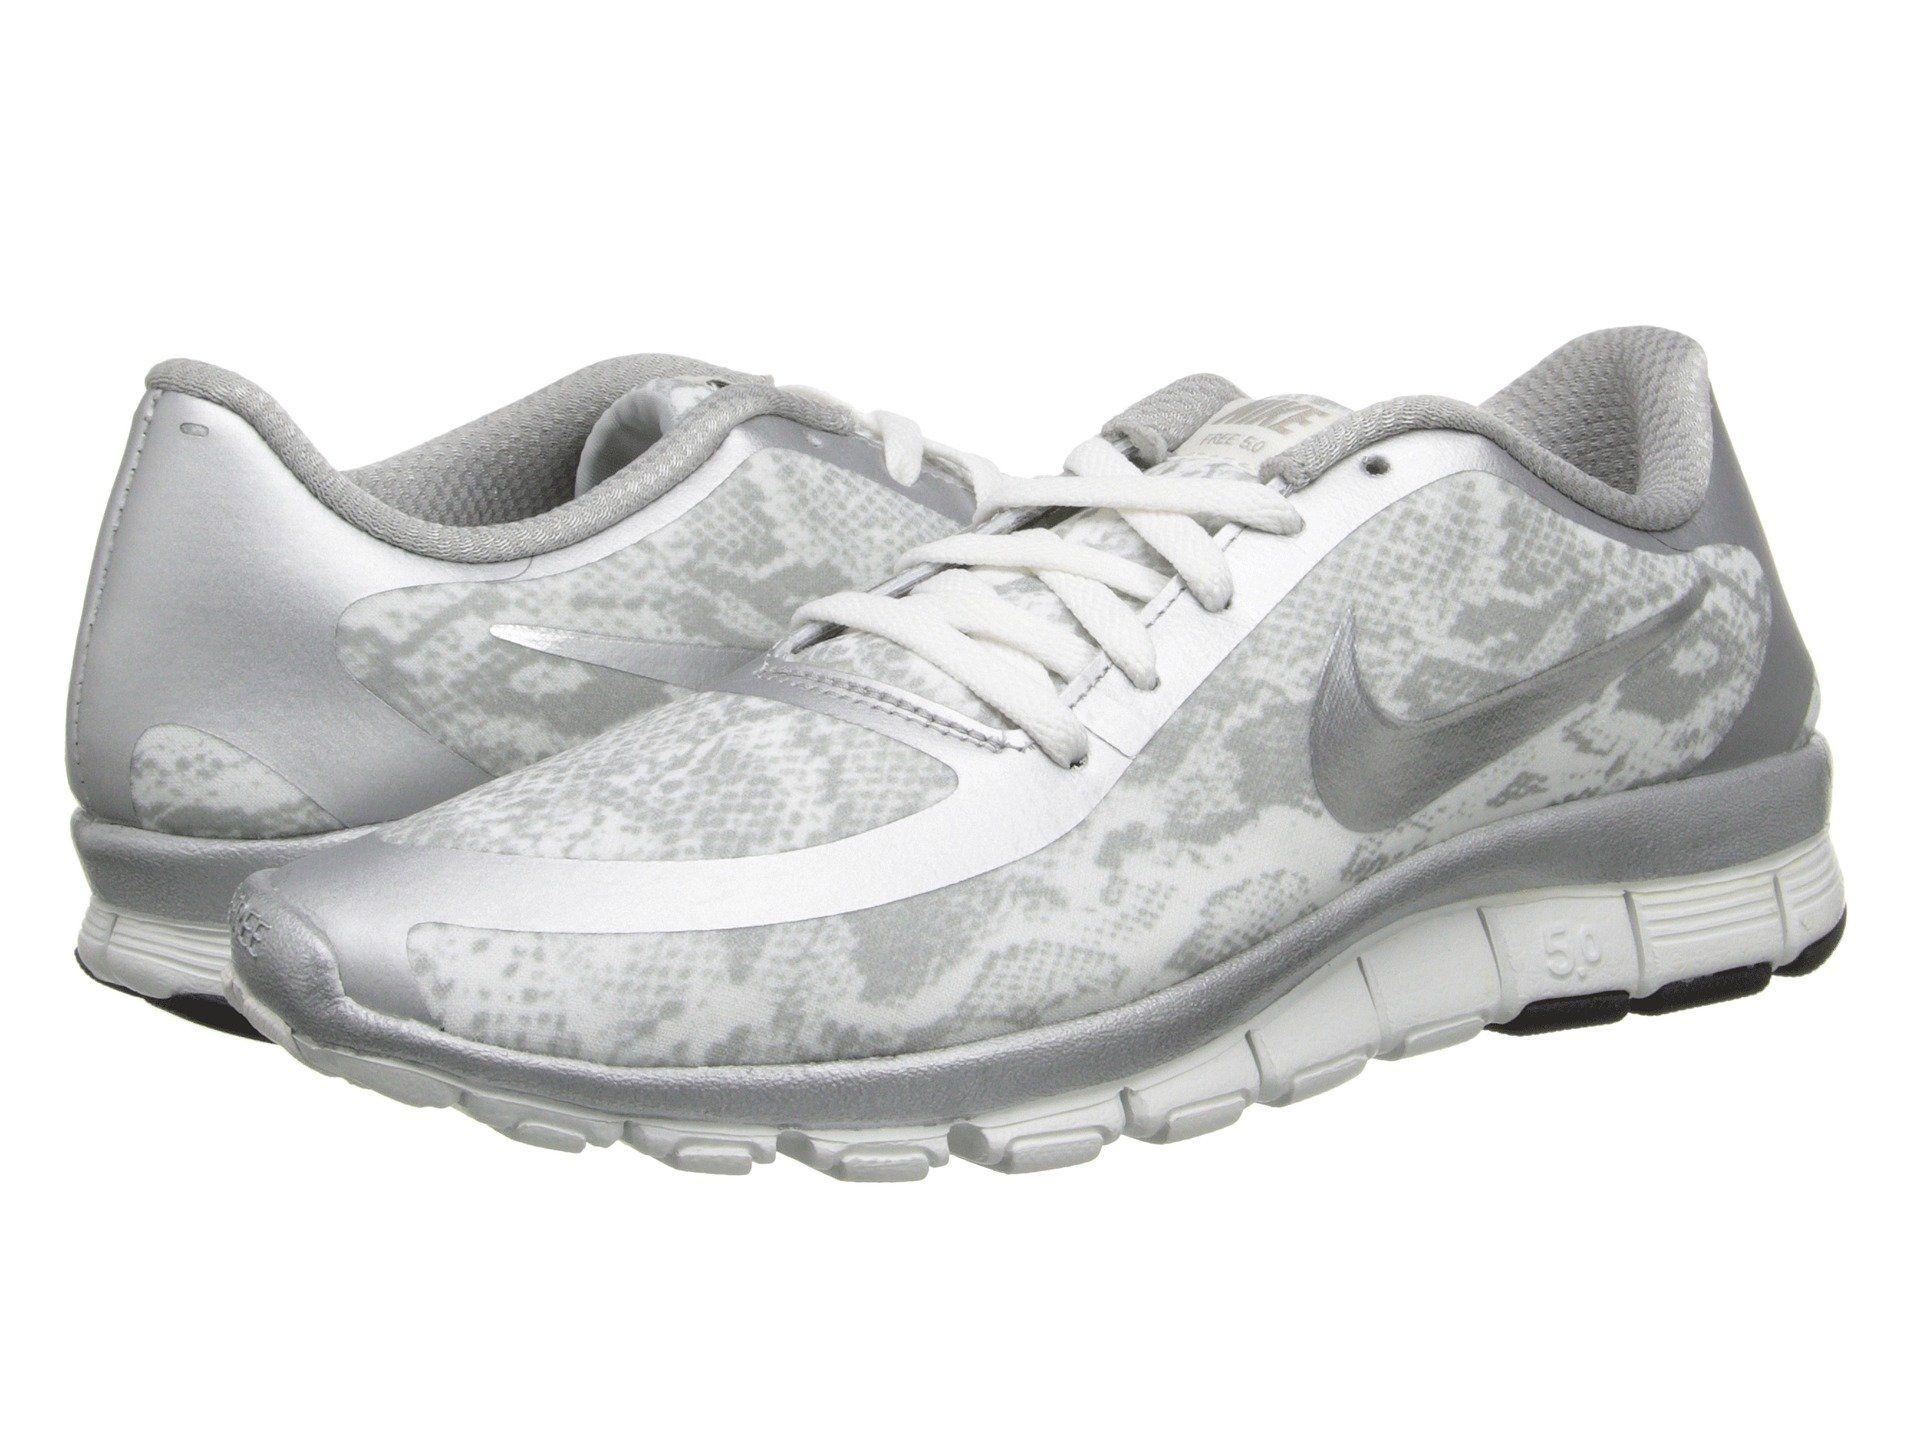 8df86493676e  59.99 (free shipping) SIZE 7.5- Free 5.0 V4 Nike